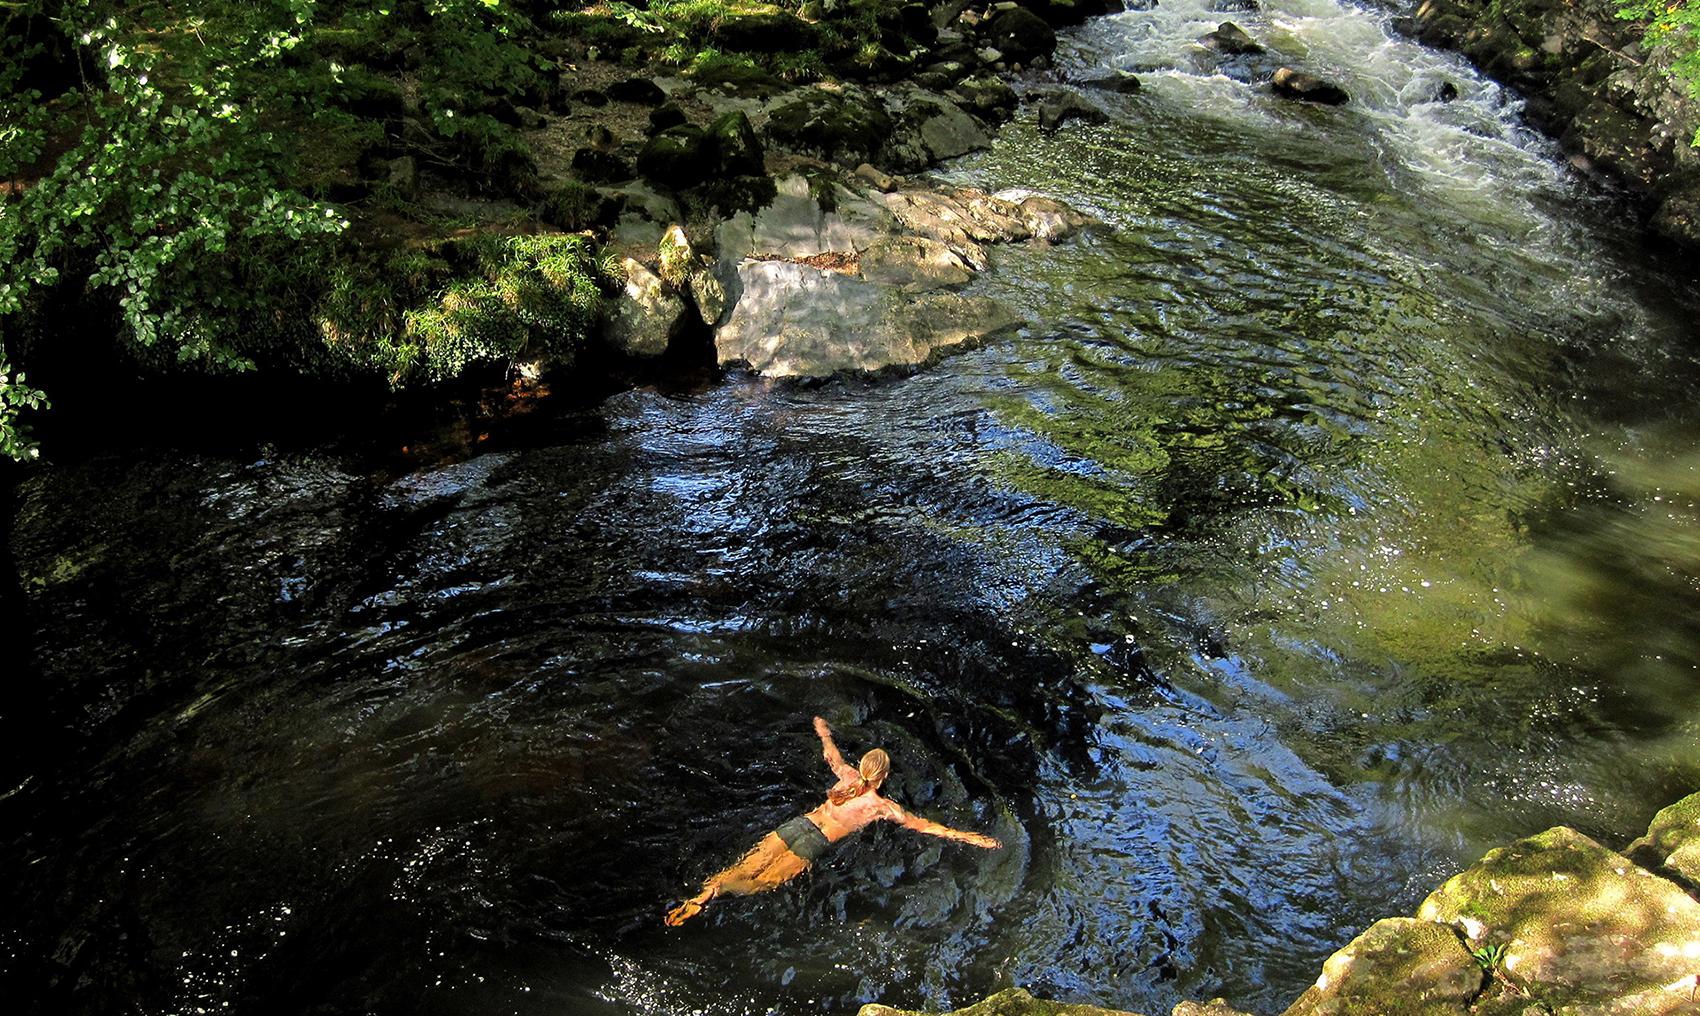 Do not swim against the stream, do not swim with the stream, swim where you want 32